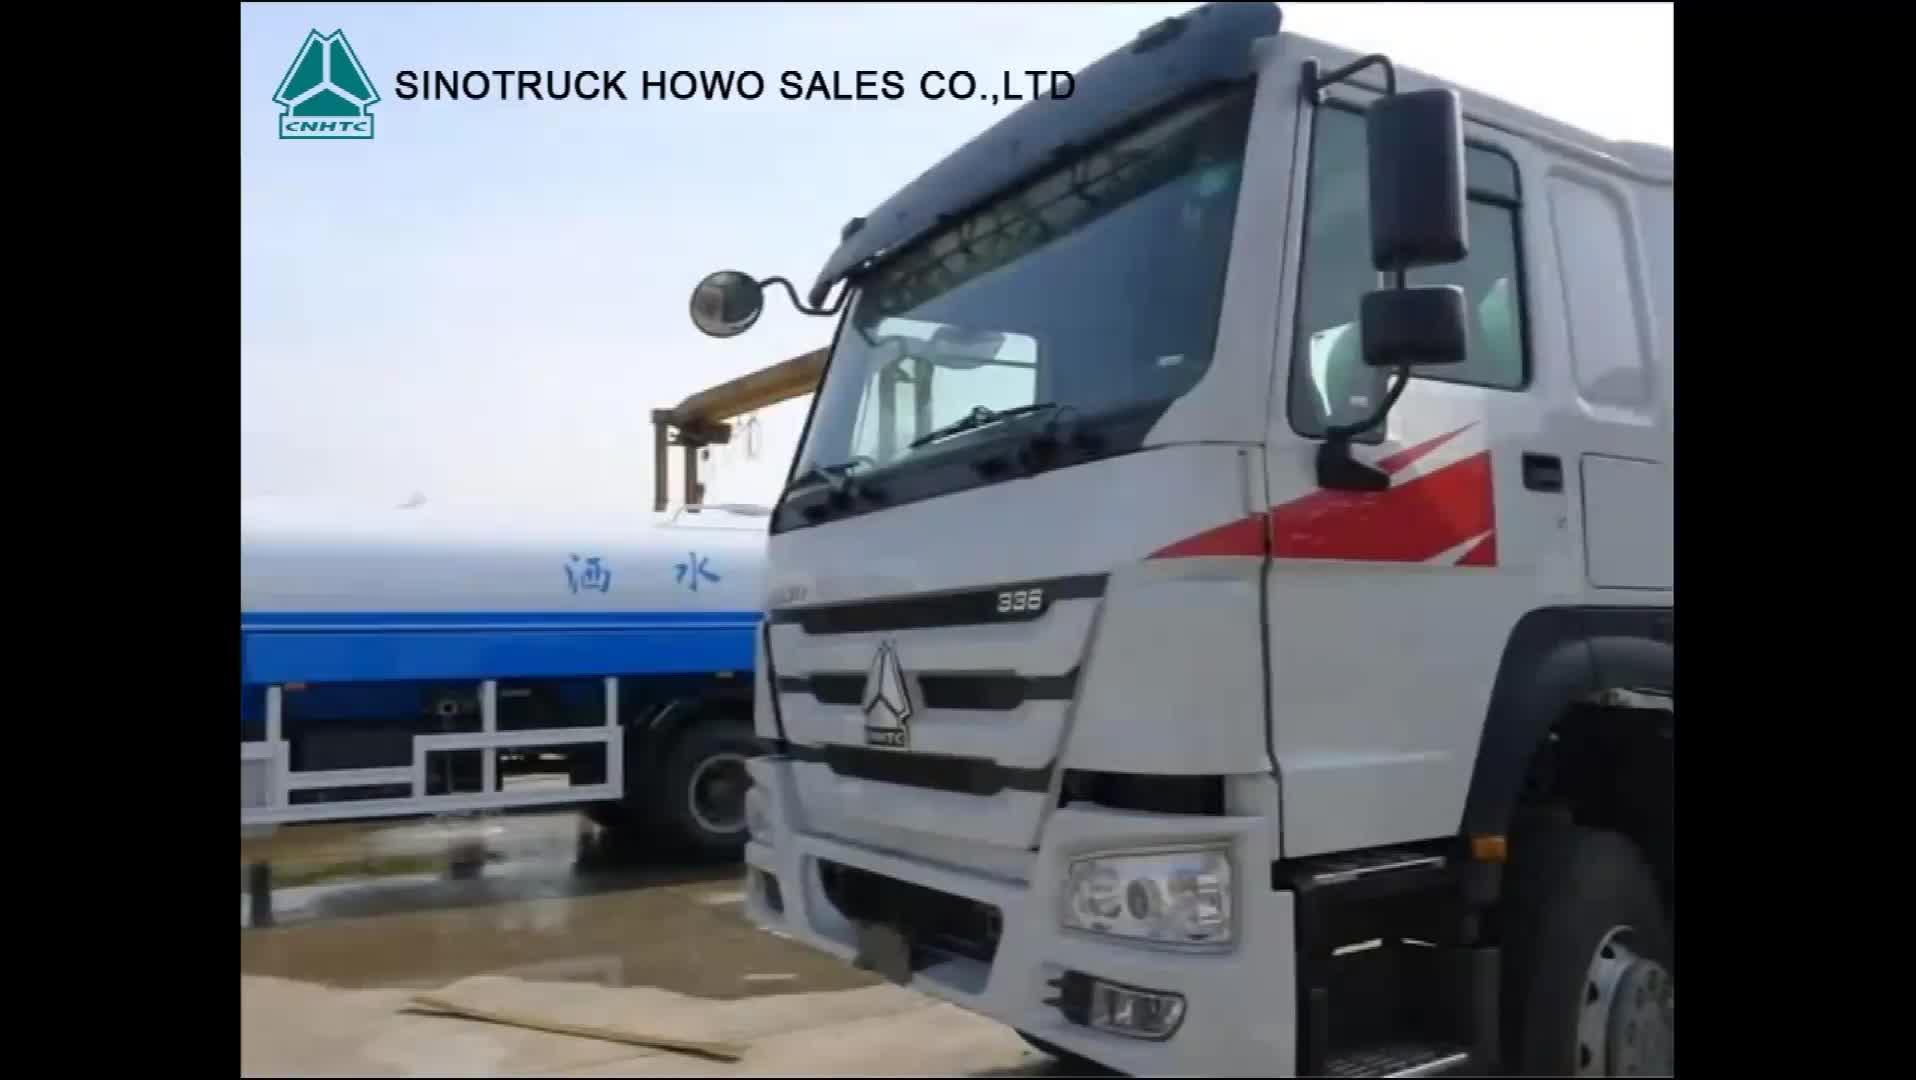 SINOTRUK HOWO A7 6X4 8 9 10 12 입방 미터 믹스 혼합 펌프 Transit 시멘트 콘크리트 트럭 믹서